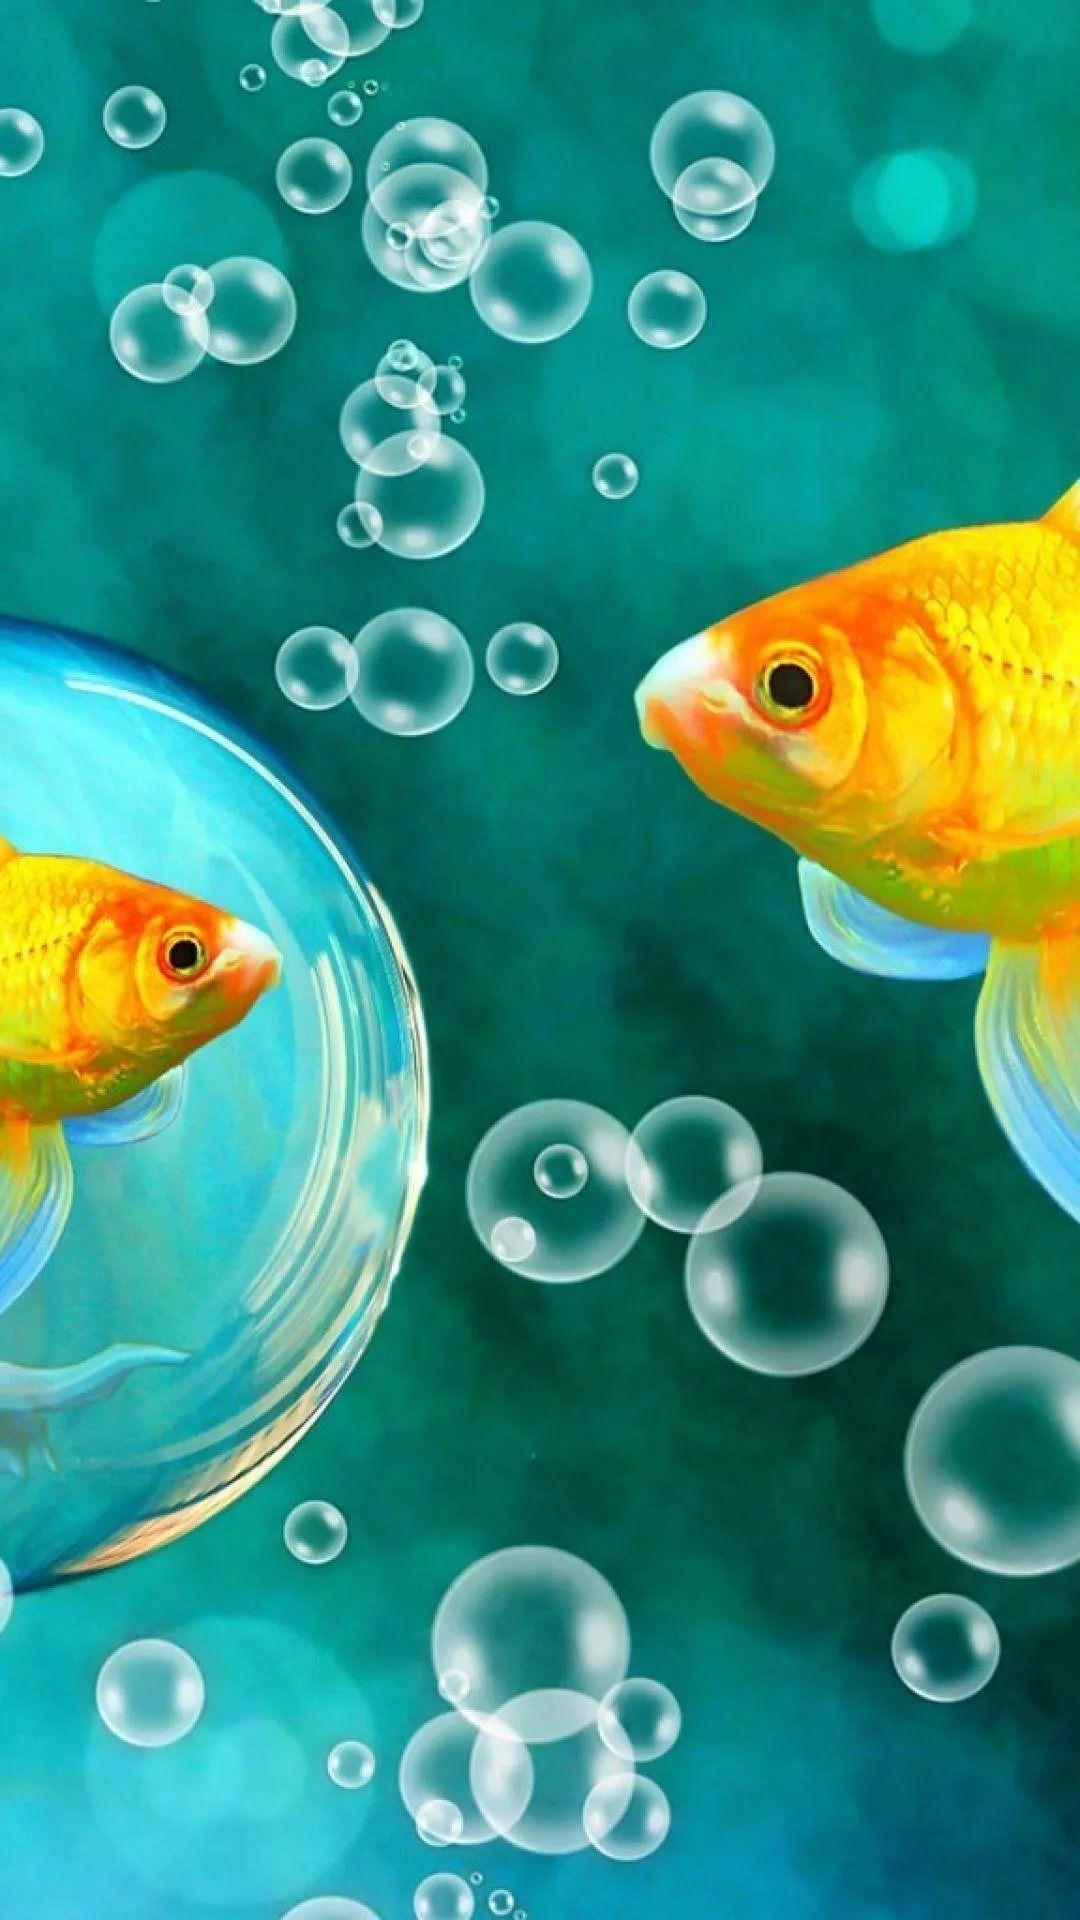 Fish iPhone xs max wallpaper